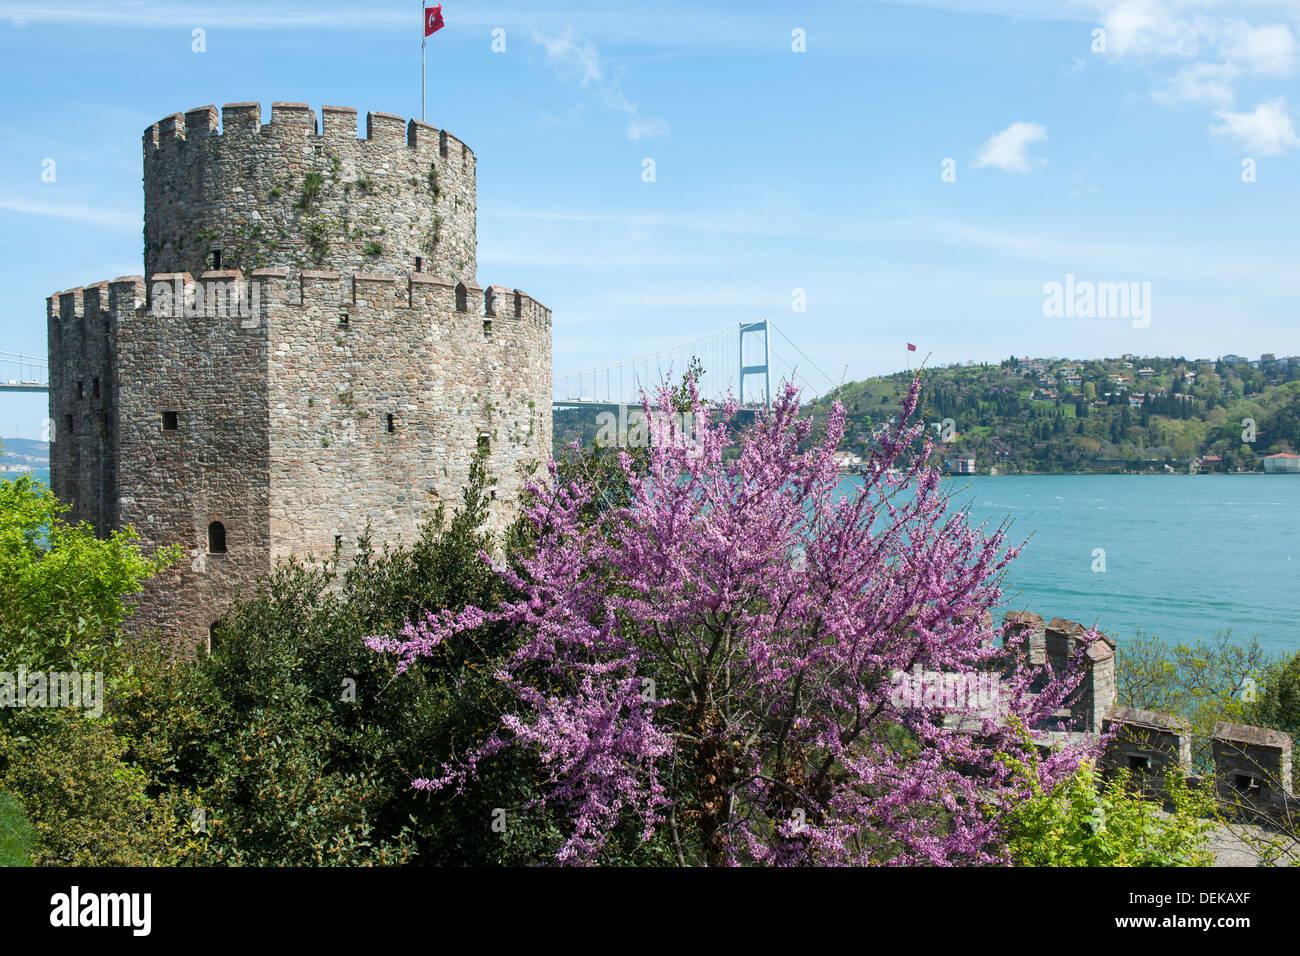 Istanbul, Sariyer, Rumelihisar, im Frühling blühen die Judasbäume - Stock Image